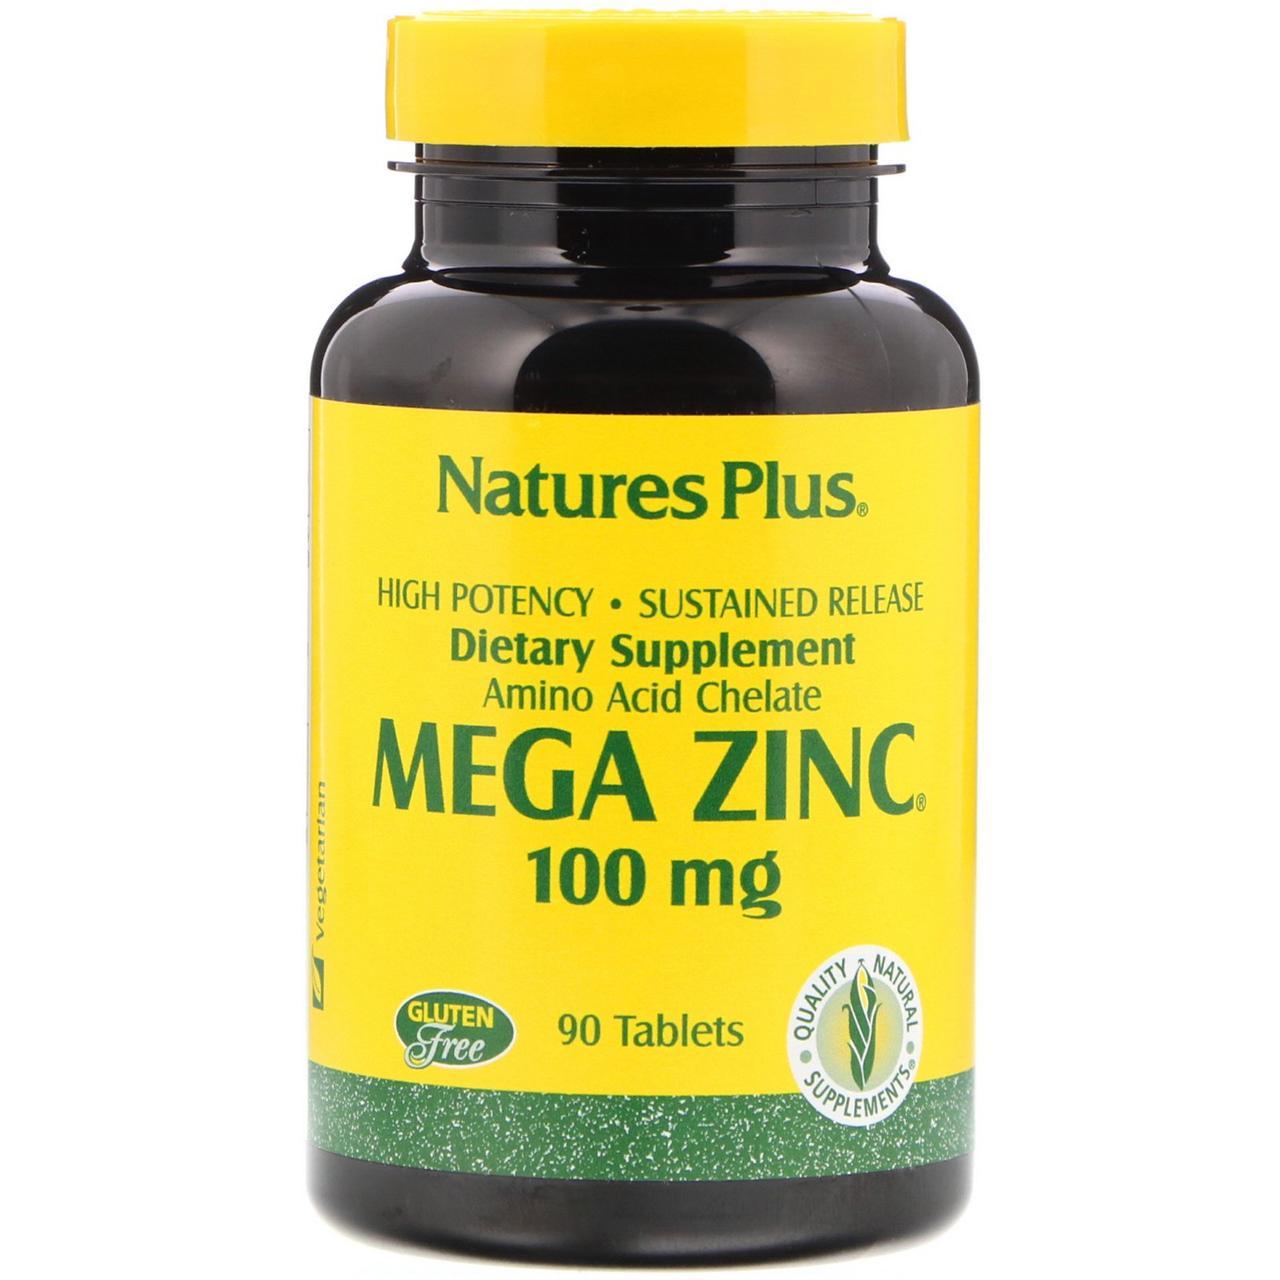 Хелатный Мега цинк Nature's Plus, 100 мг, 90 таблеток